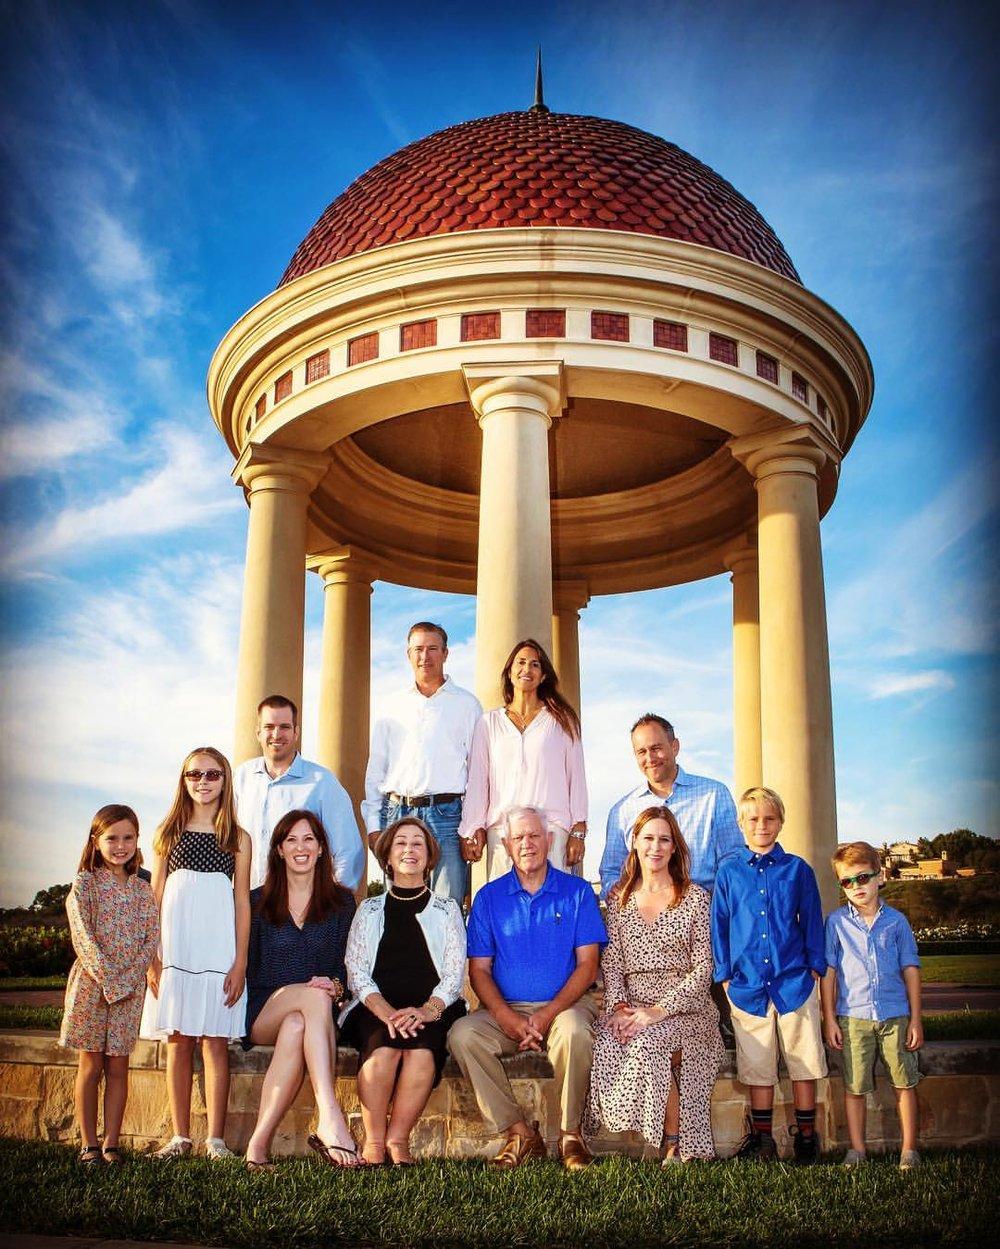 Family portraits in Newport Coast at Pelican Hill Resort.  #FamilyPortraits #Family #FamilyPhotography #OrangeCountyPhotographer #FamilyPhotoInspiration #PelicanHill #PelicanHillResort #FamilyPhoto #FamilyPhotoShoot #FamilyPhotoPhotographer #brettwernerph